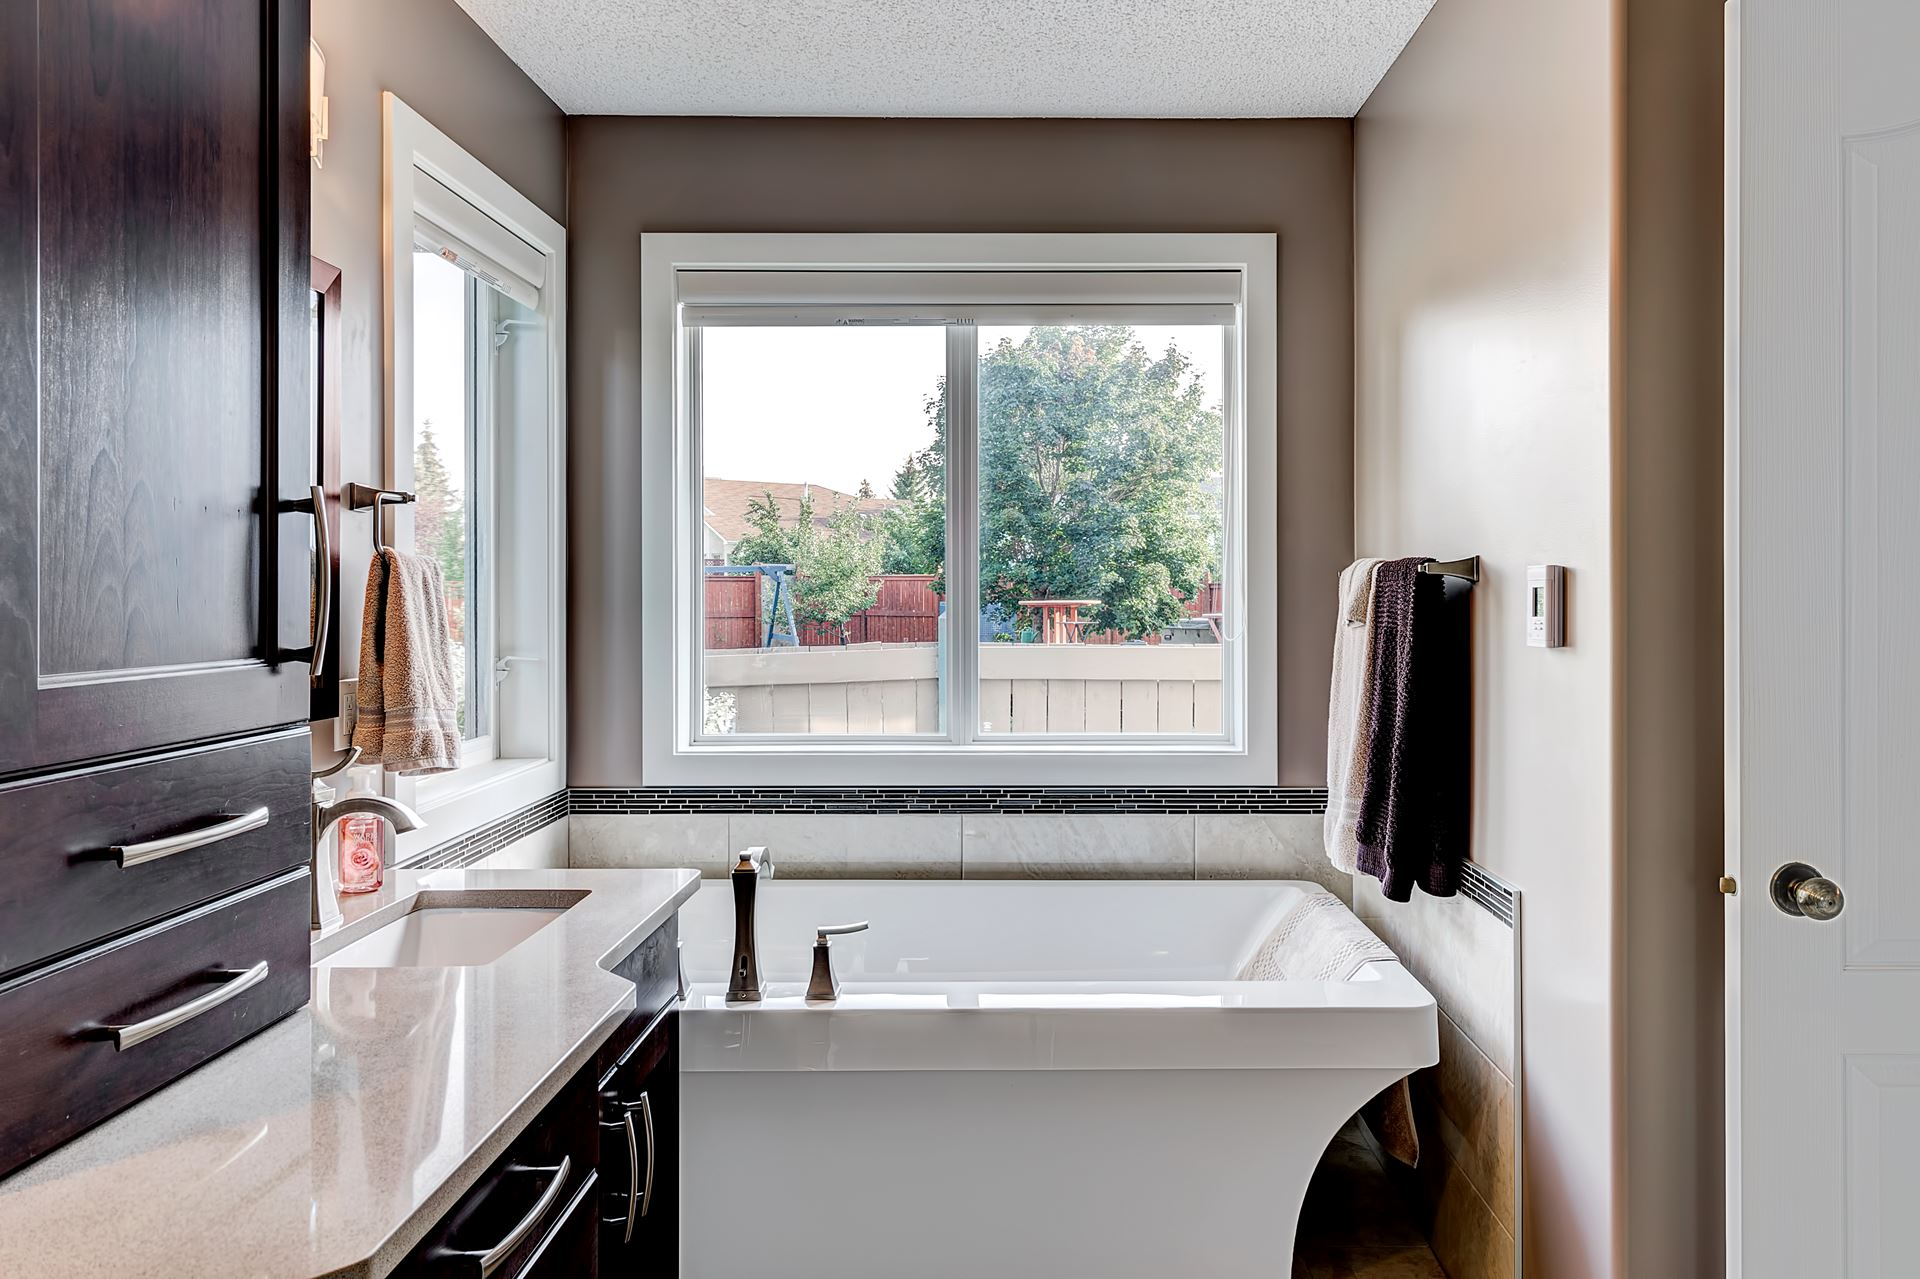 Ormsby Bathroom Renovation | Alair Homes Edmonton